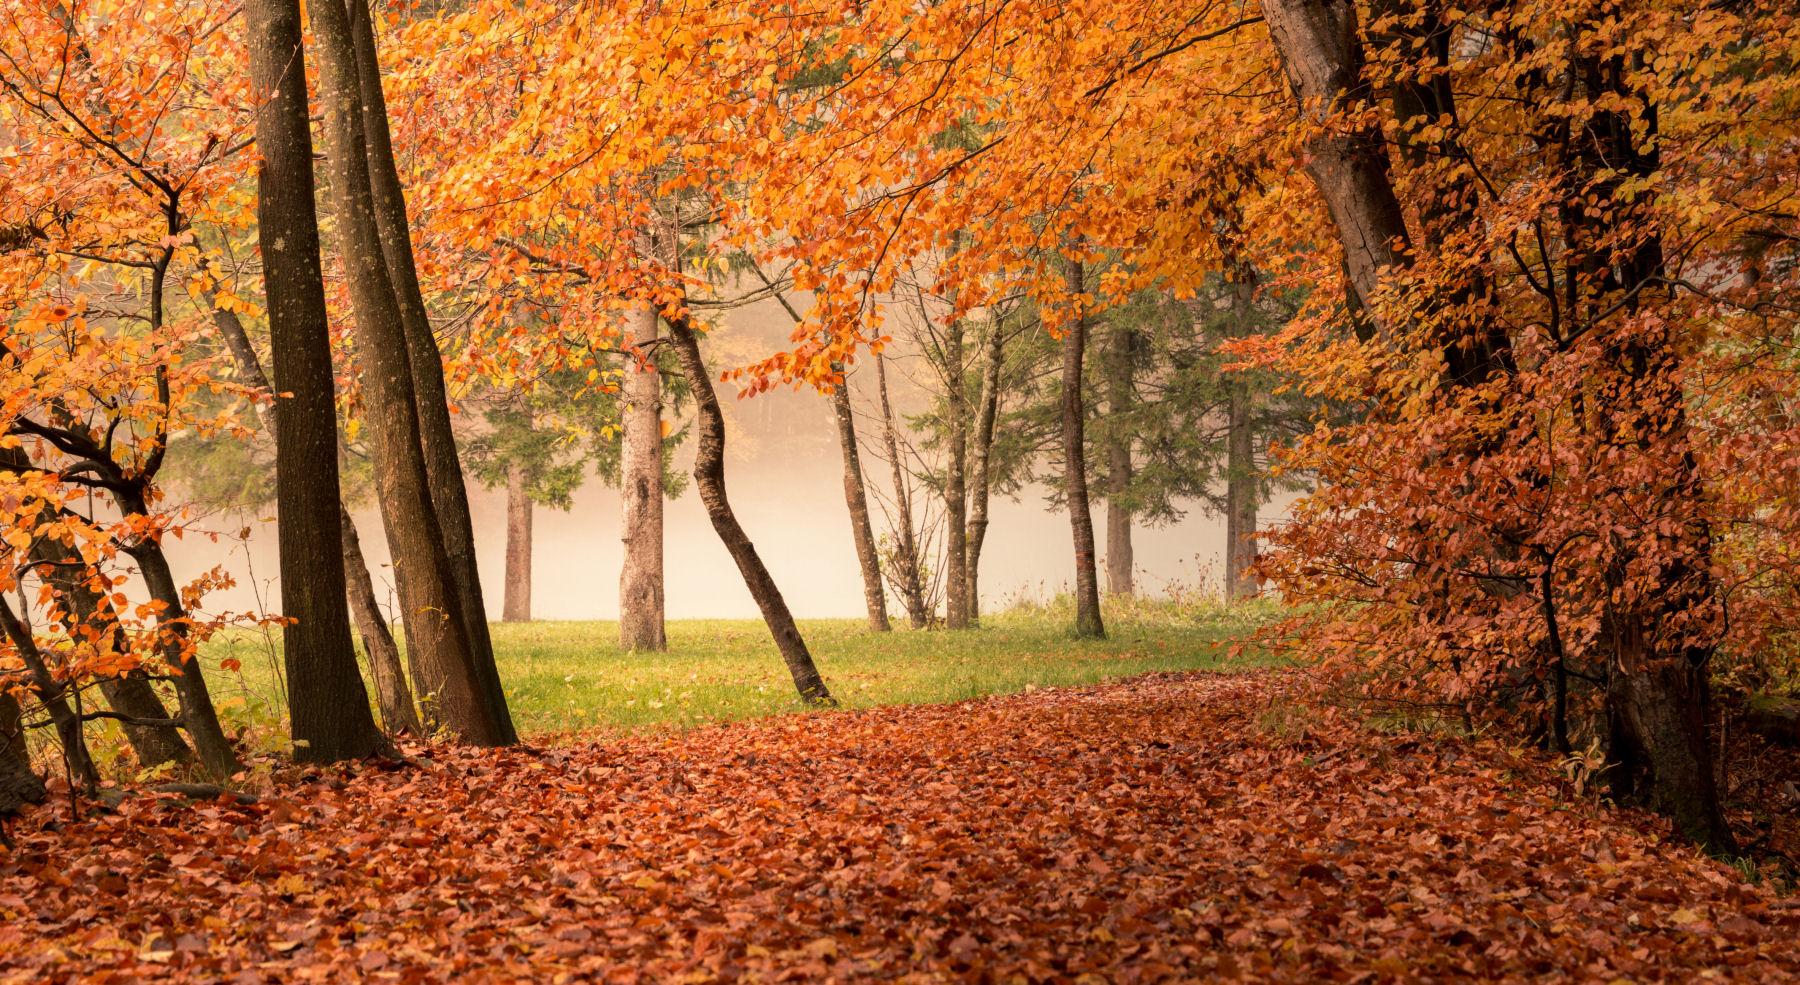 zavrsnica-valley-autumn-slovenia